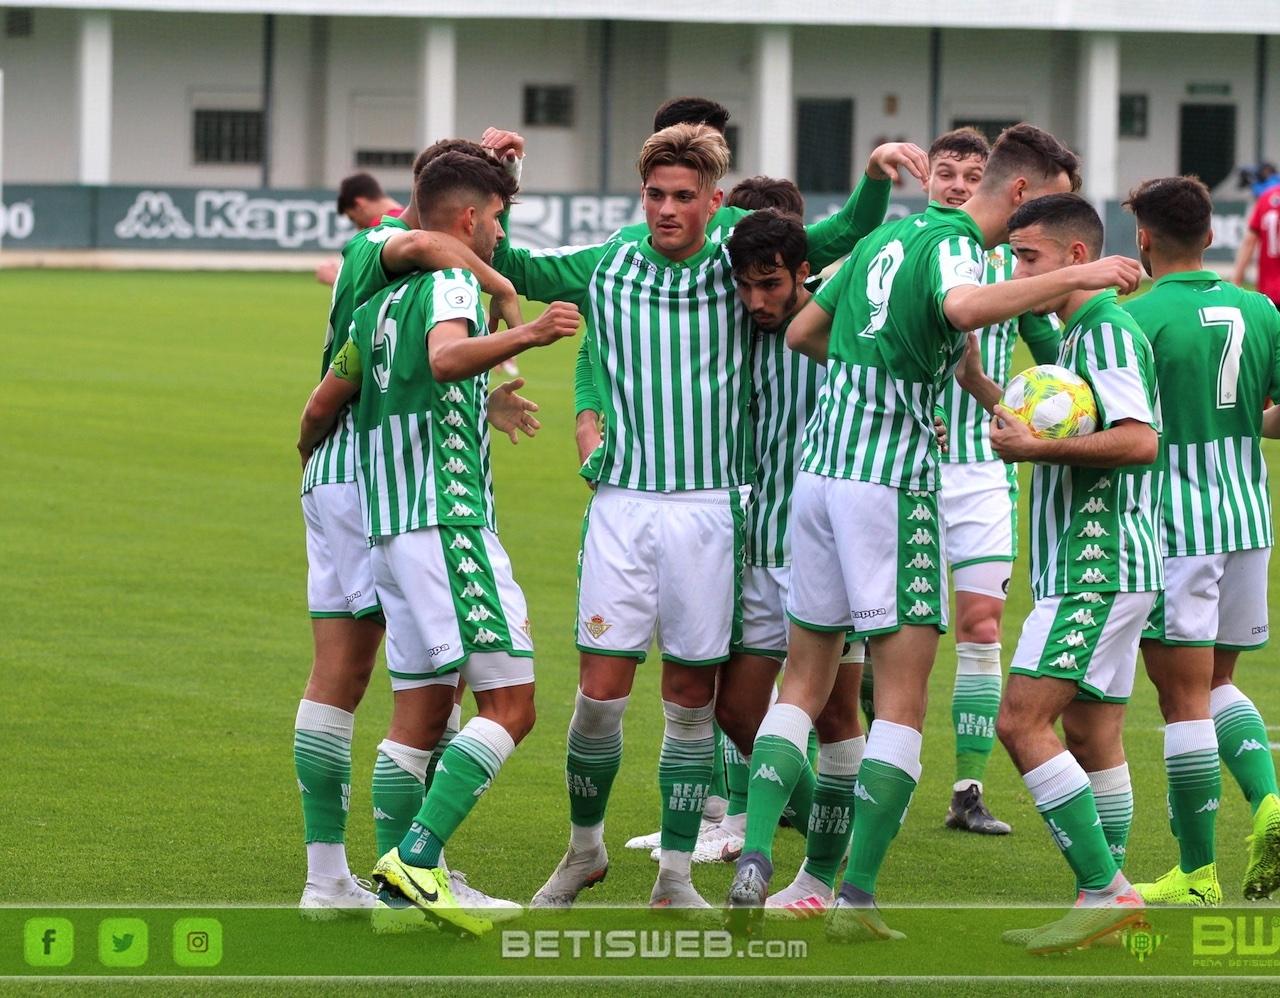 aJ18 - Betis Deportivo - Gerena 82